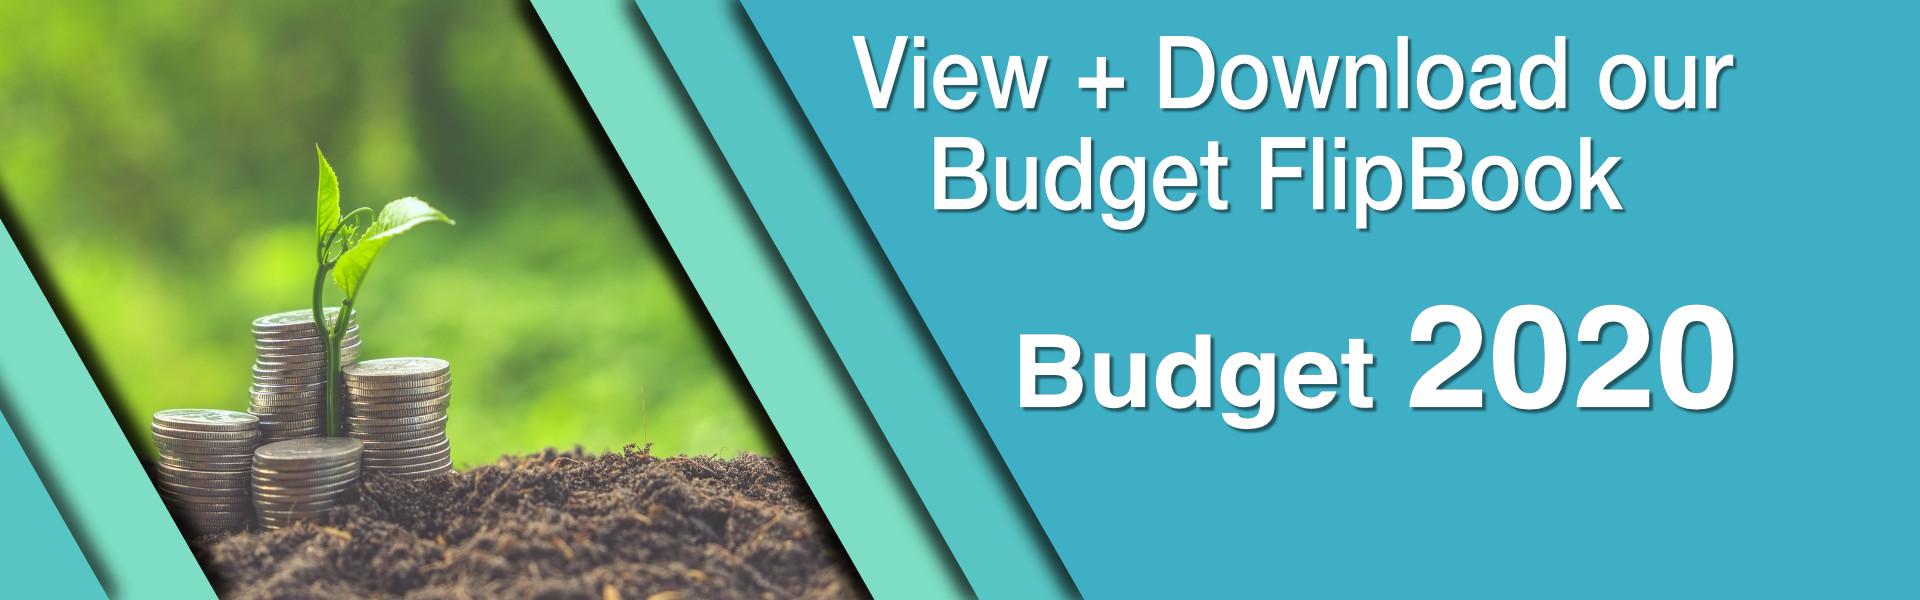 DR_Budget2020